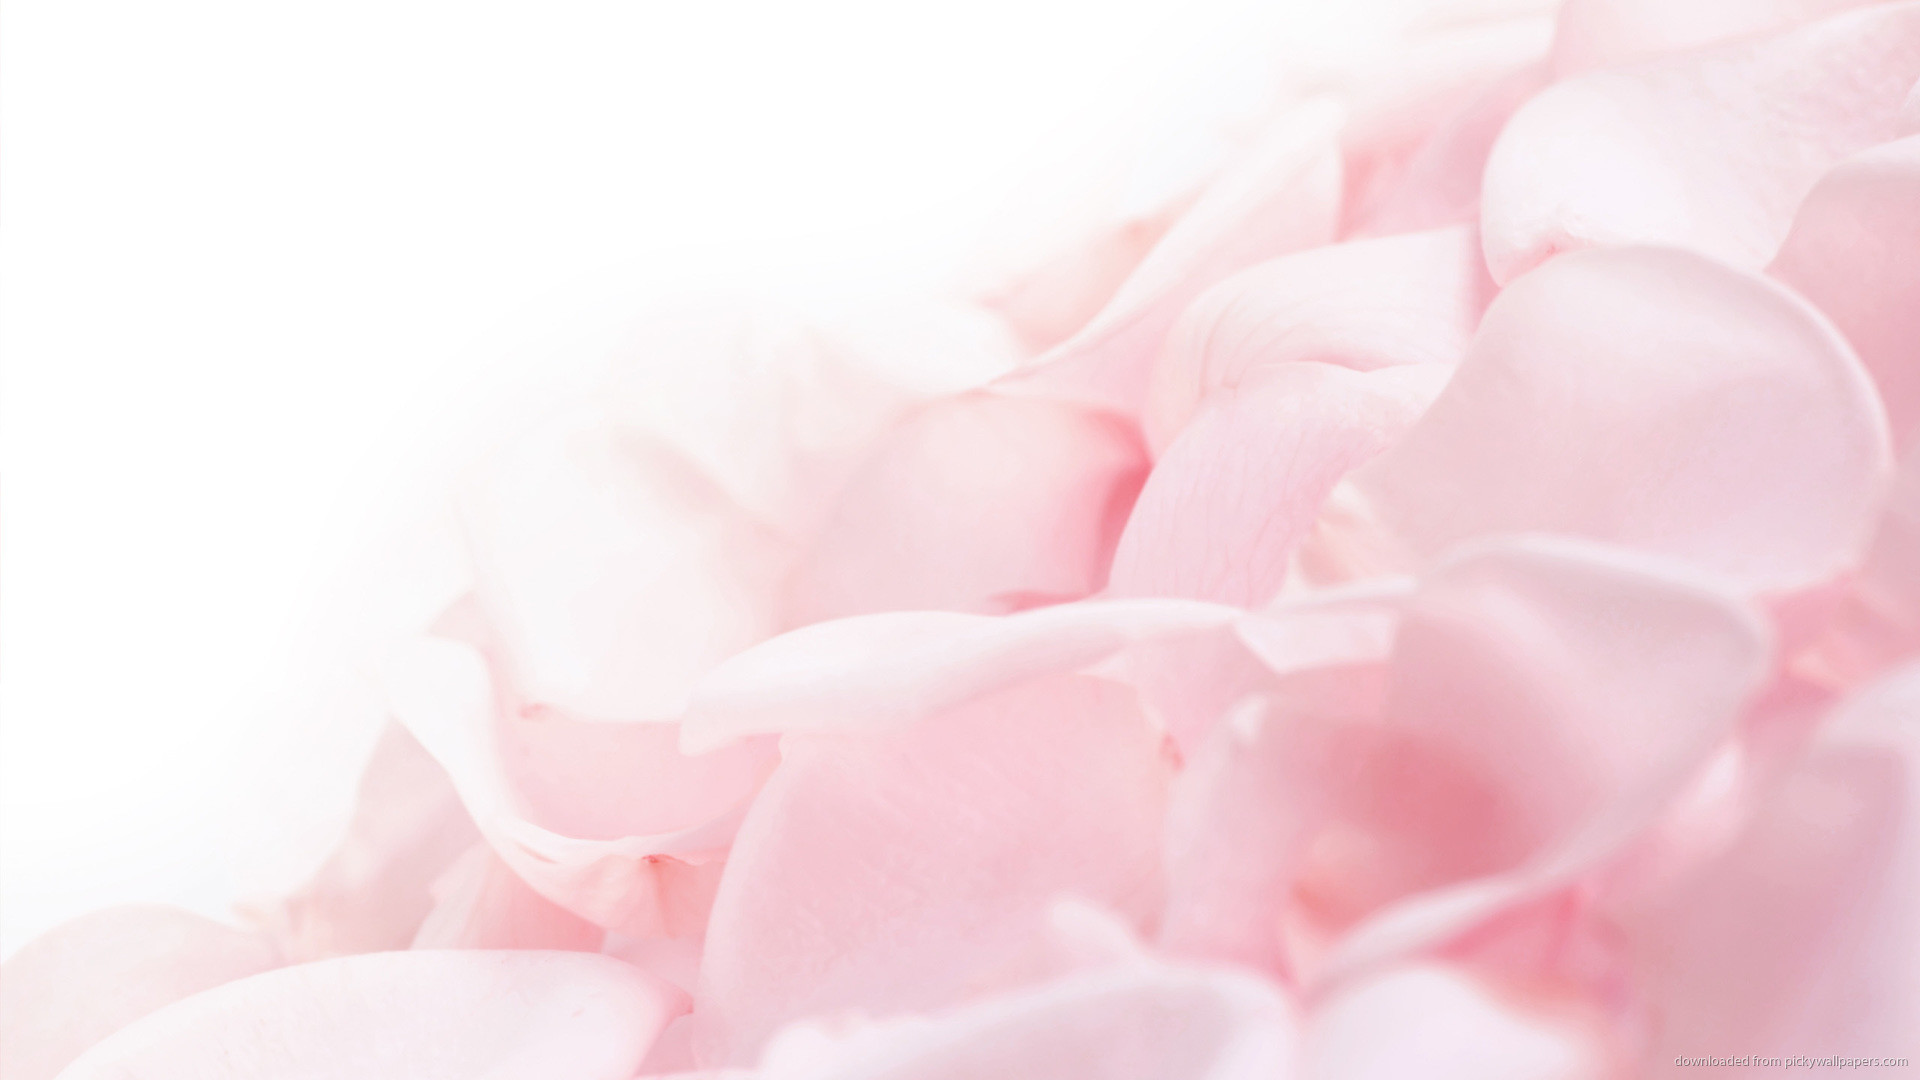 Pink Flower Petals Wallpaper Background picture